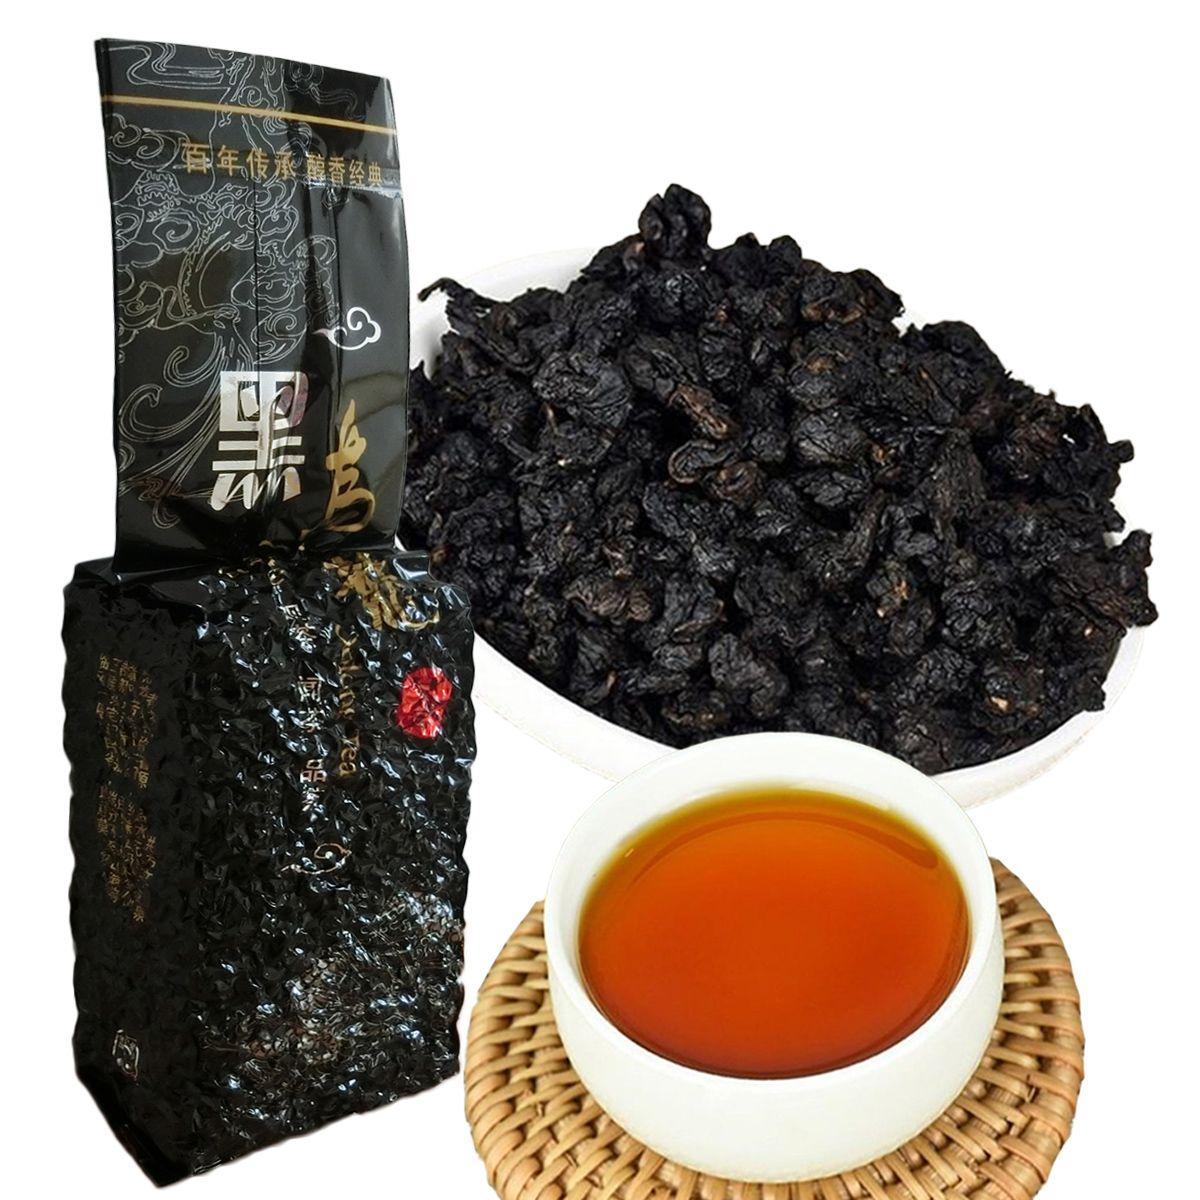 Sıcak satış 250g Çin Organik Oolong Çay Siyah Oolong Fırında Tieguanyin Siyah Çay Sağlık Yeni Bahar Çay Yeşil Gıda